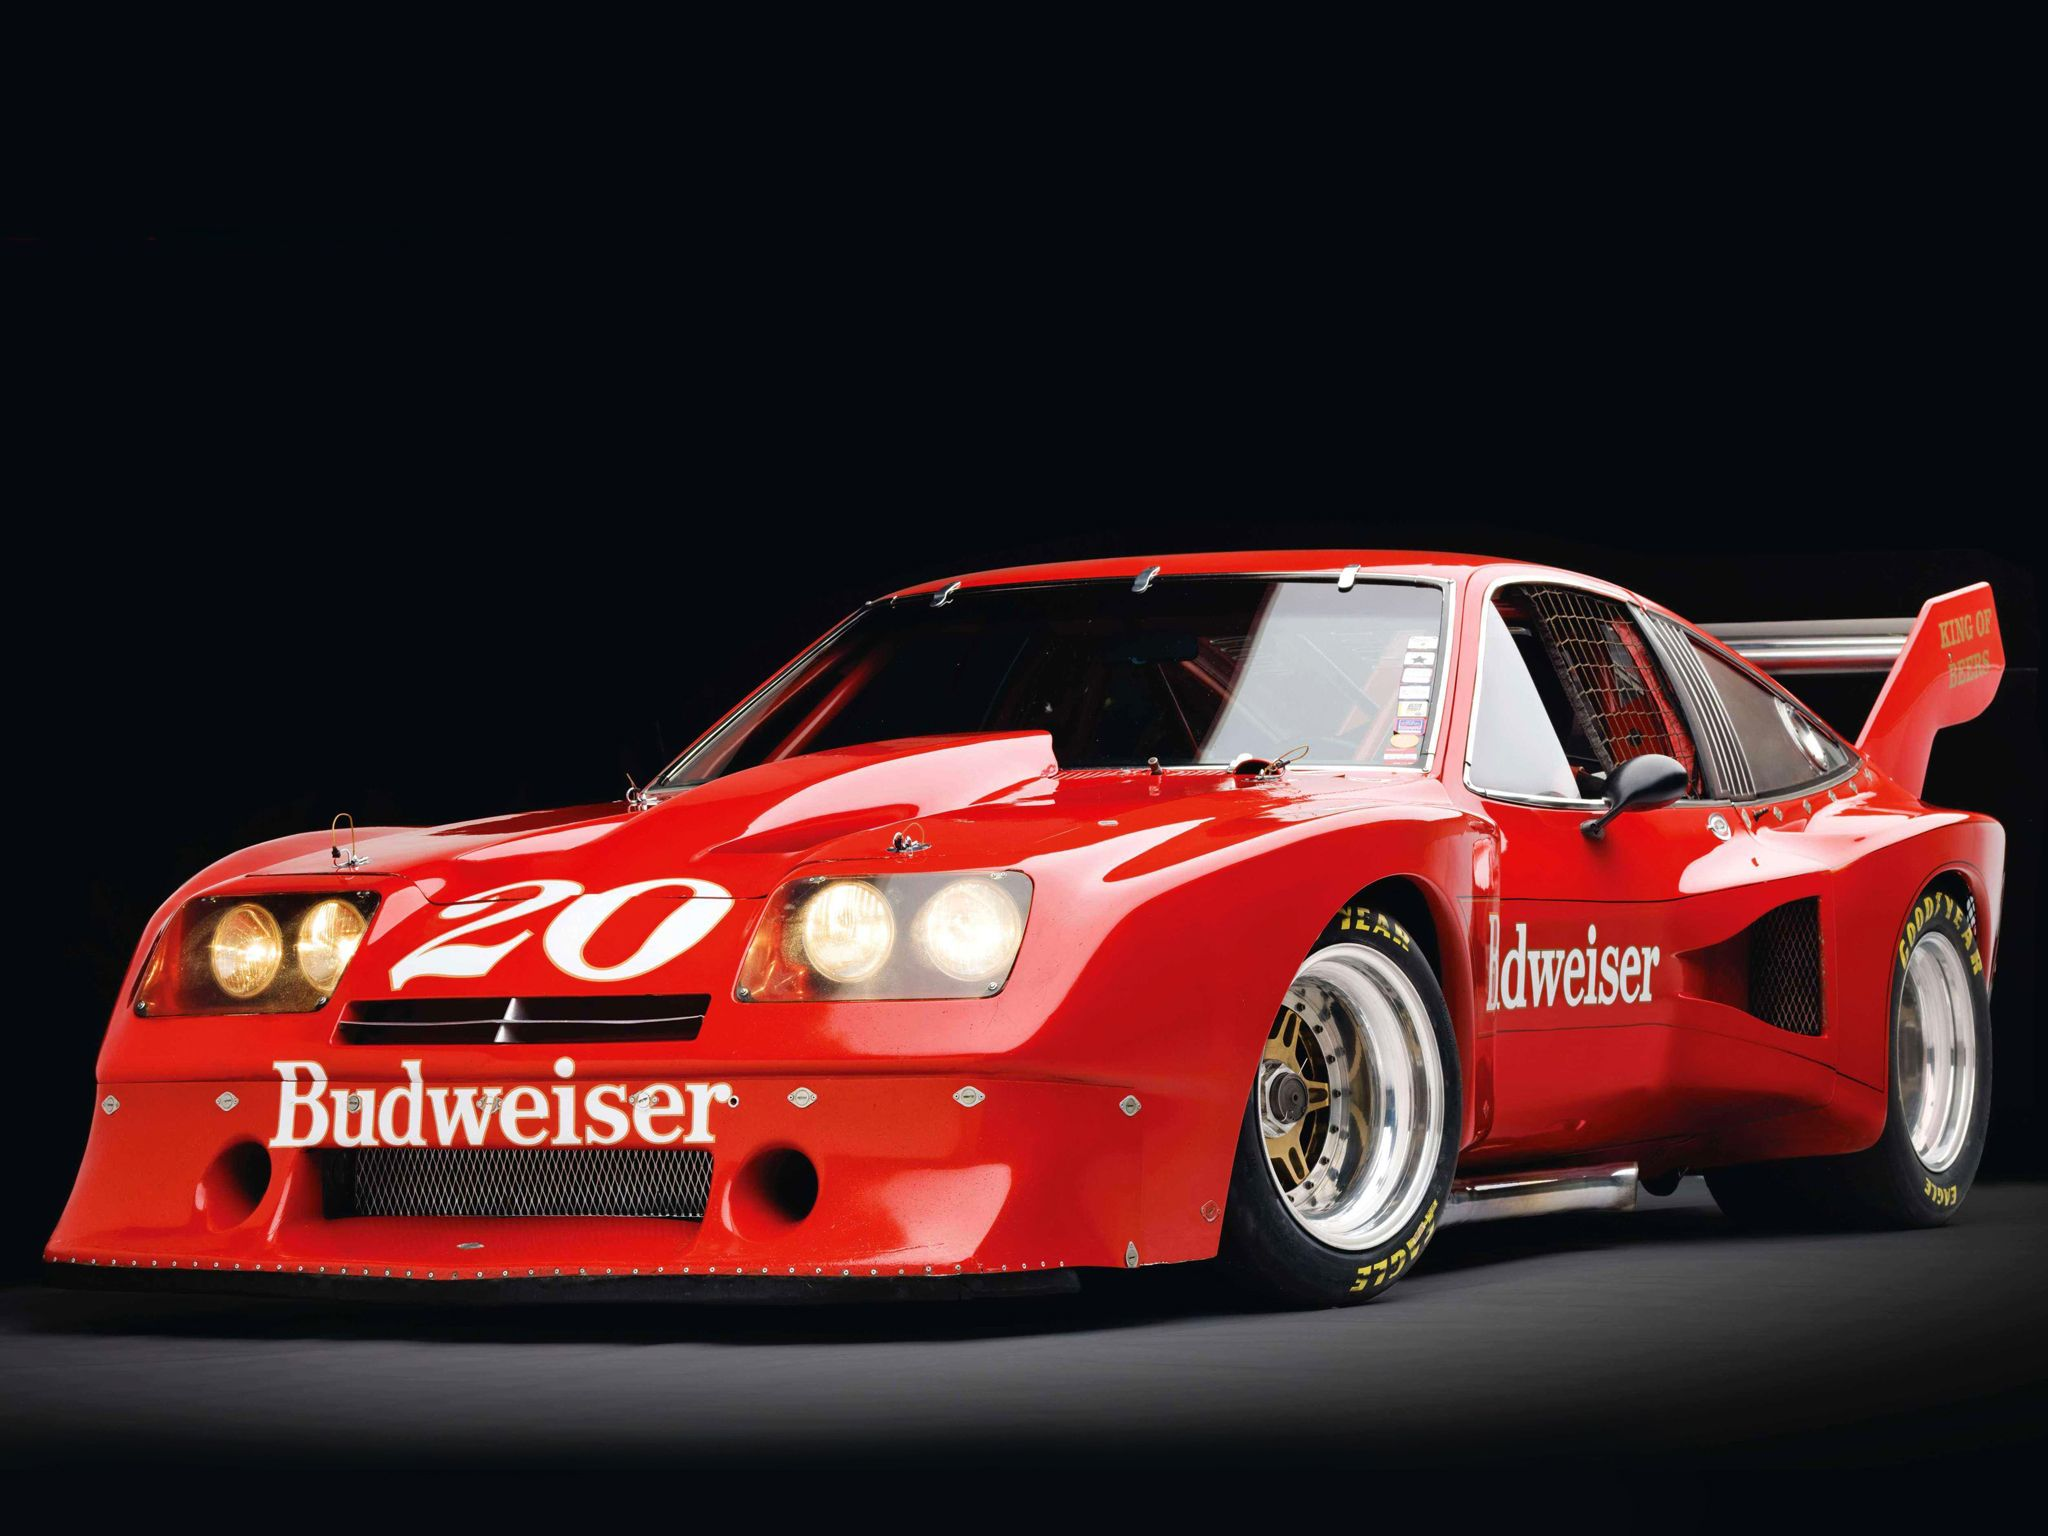 1975 Chevrolet Monza Dekon Imsa Gto Race Racing Classic